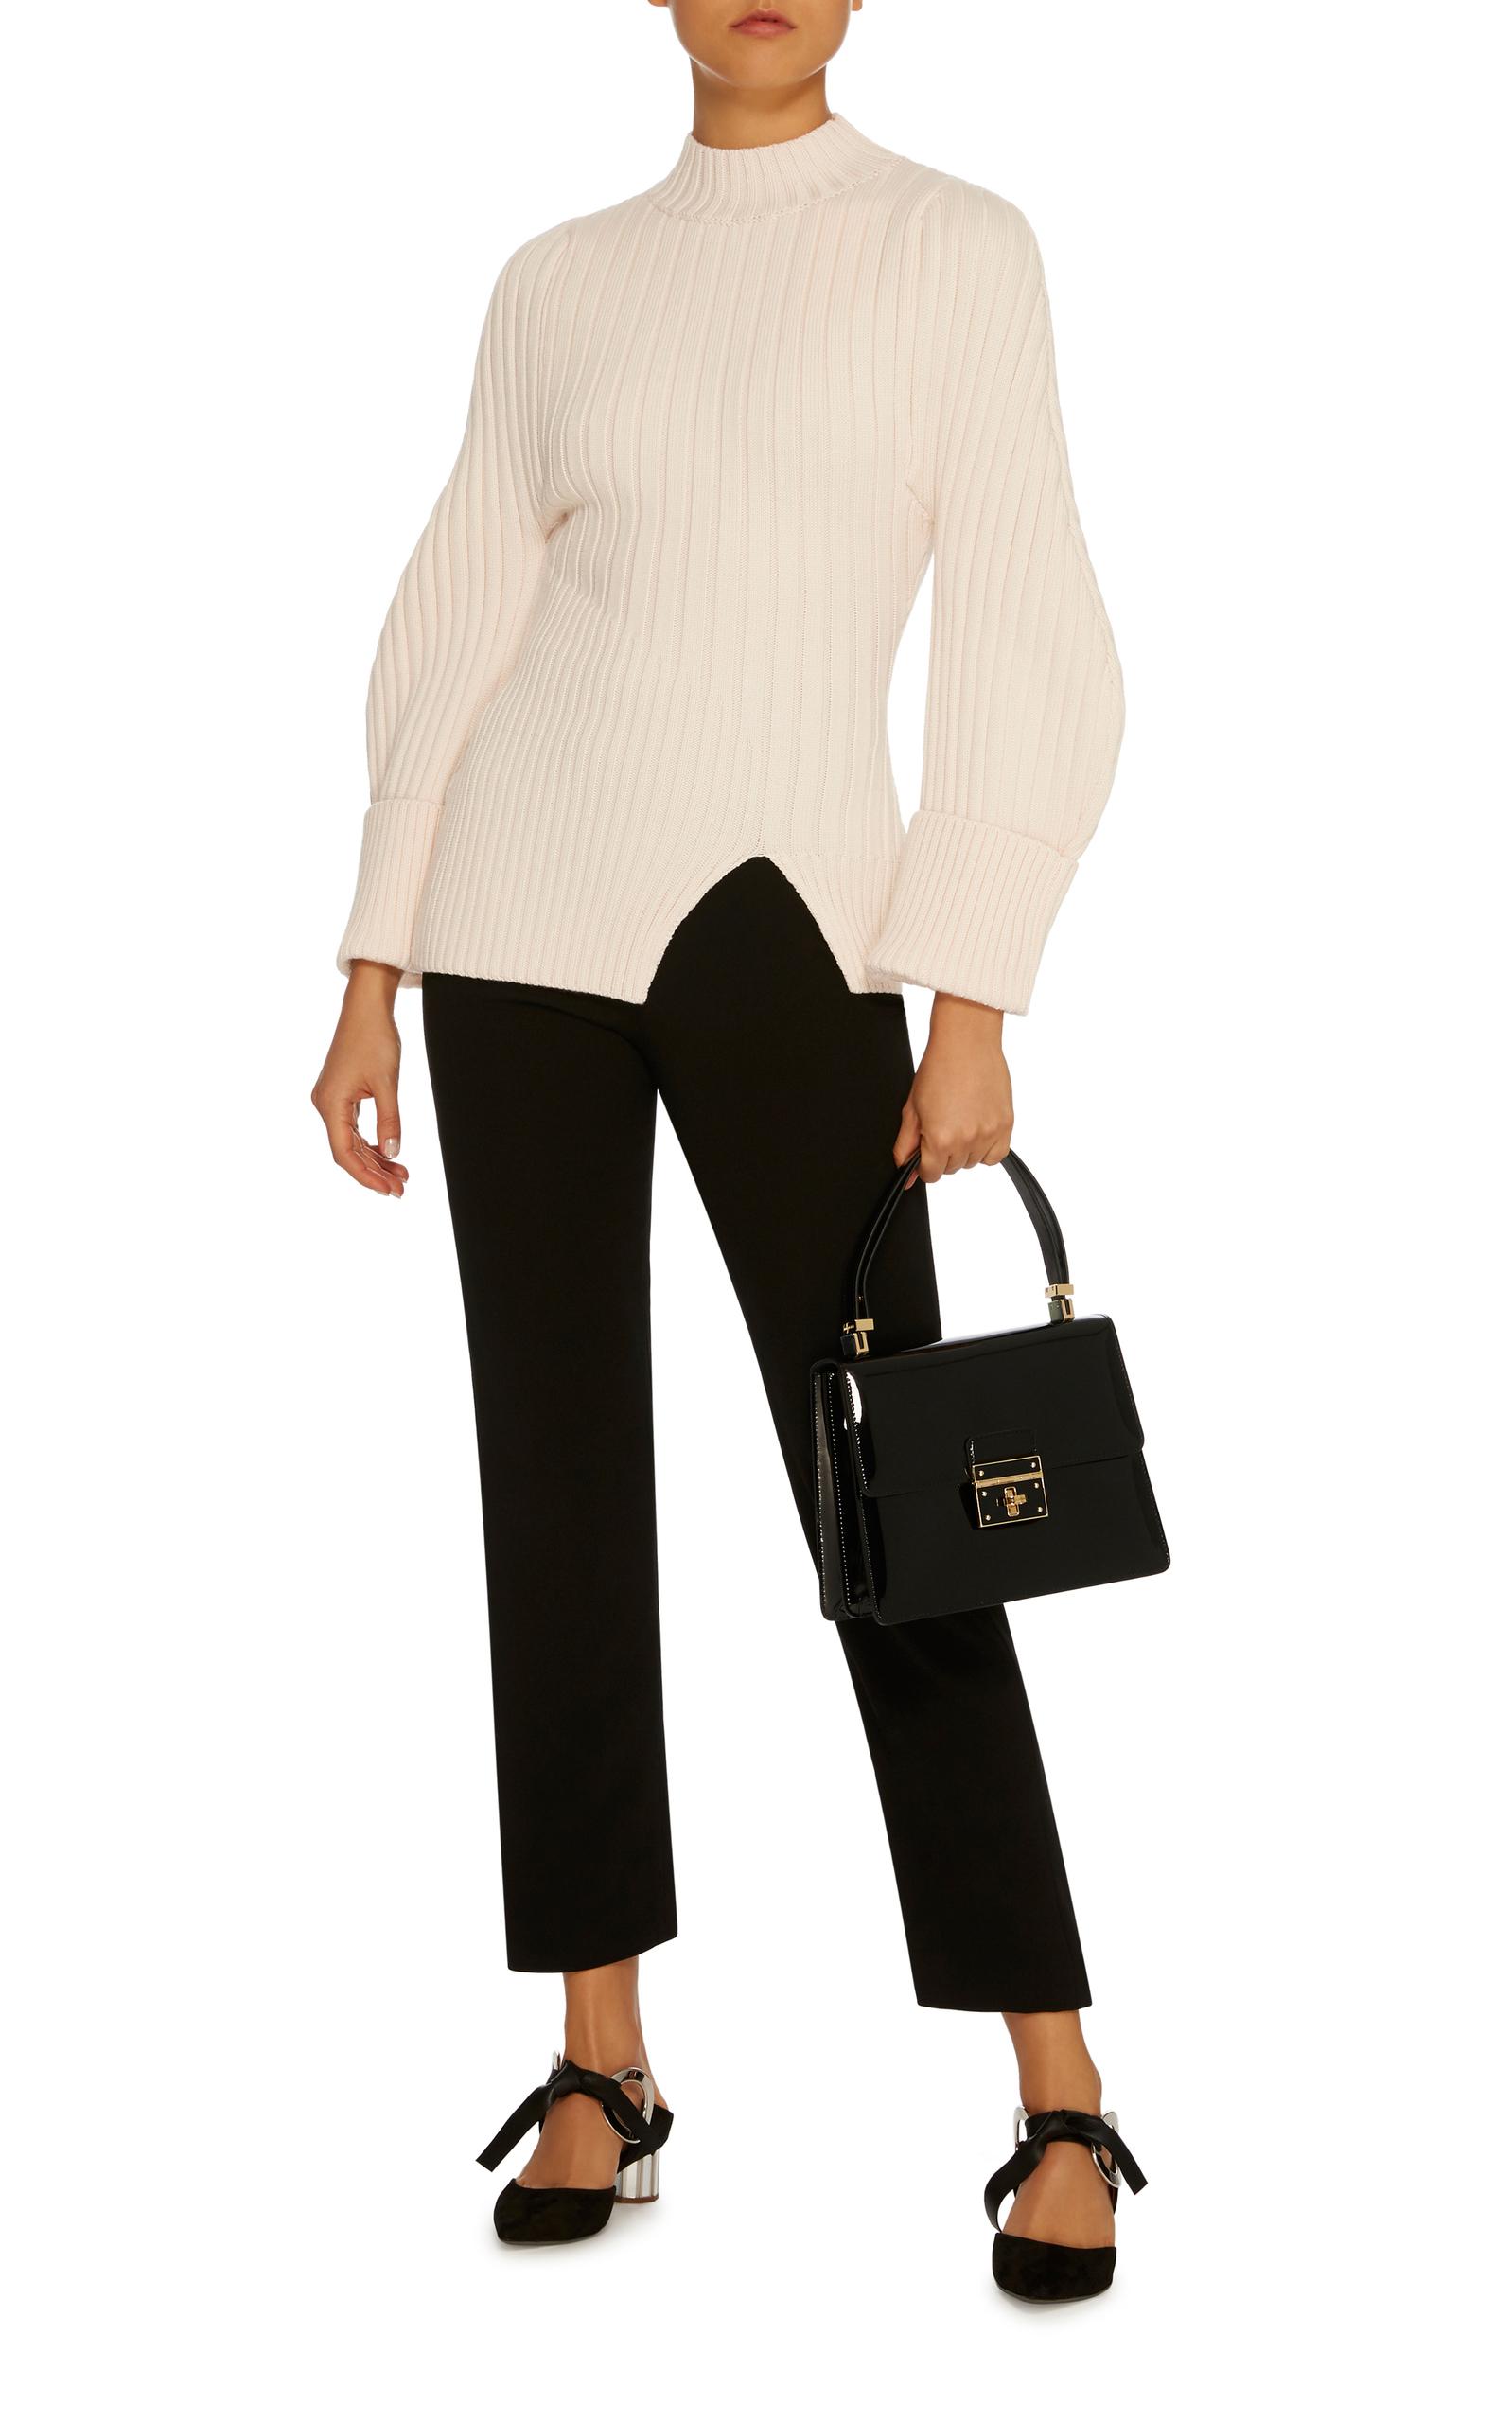 Moda Operandi Jacquemus Wide-Sleeve Knit Sweater - £531